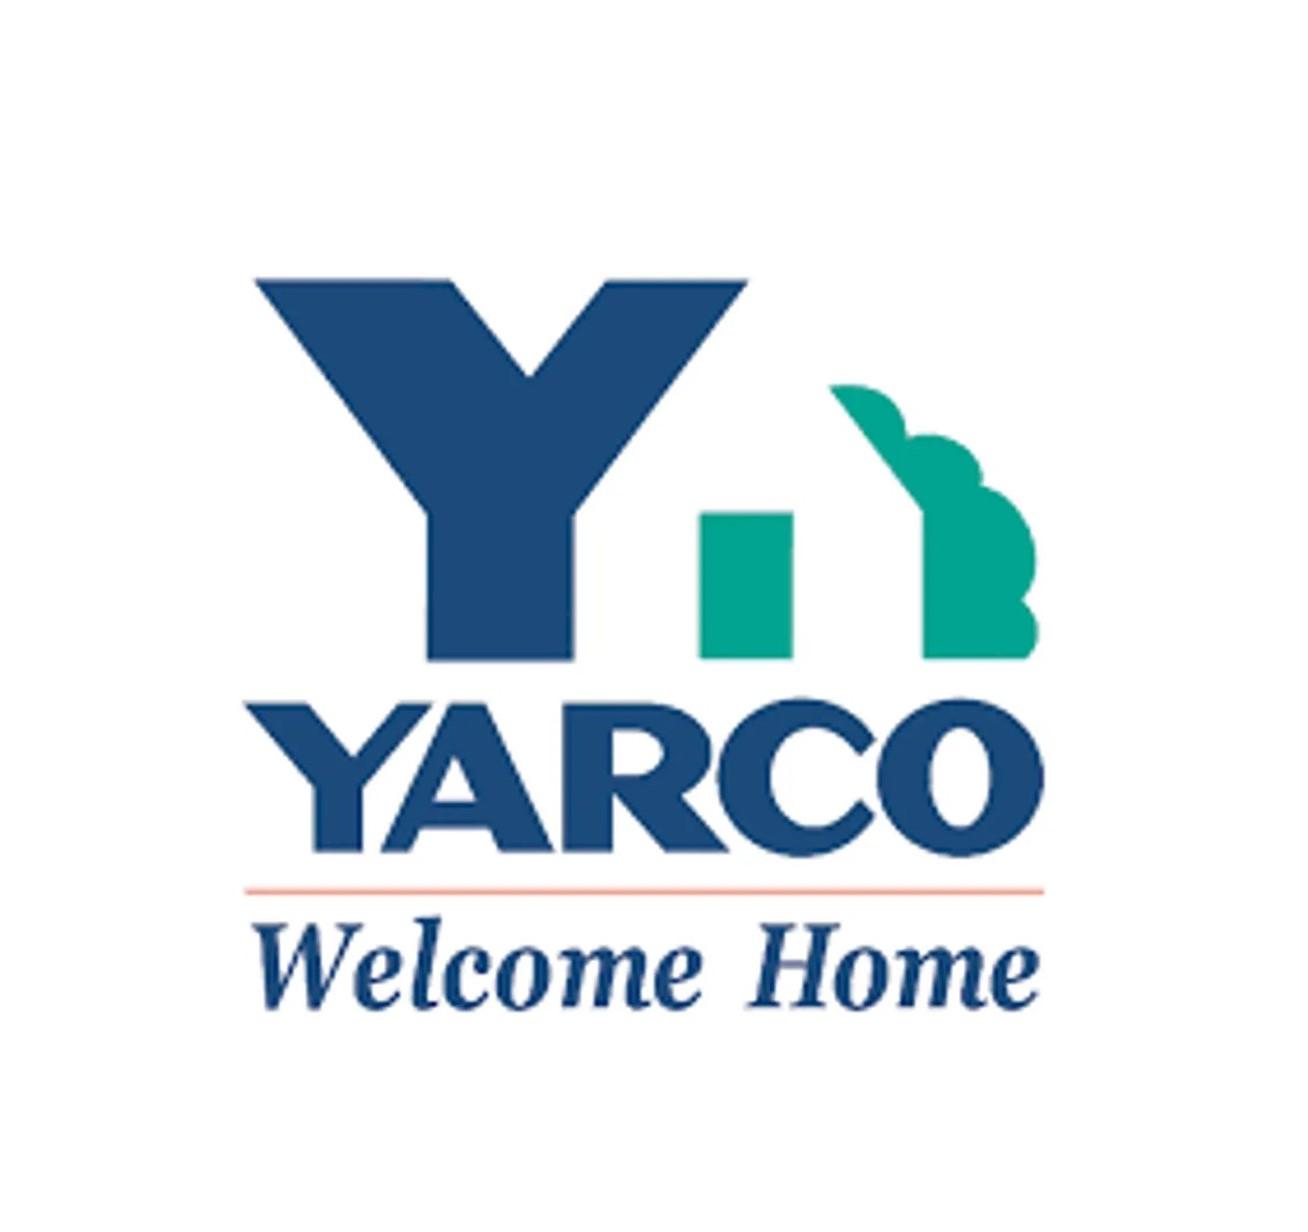 Yarco